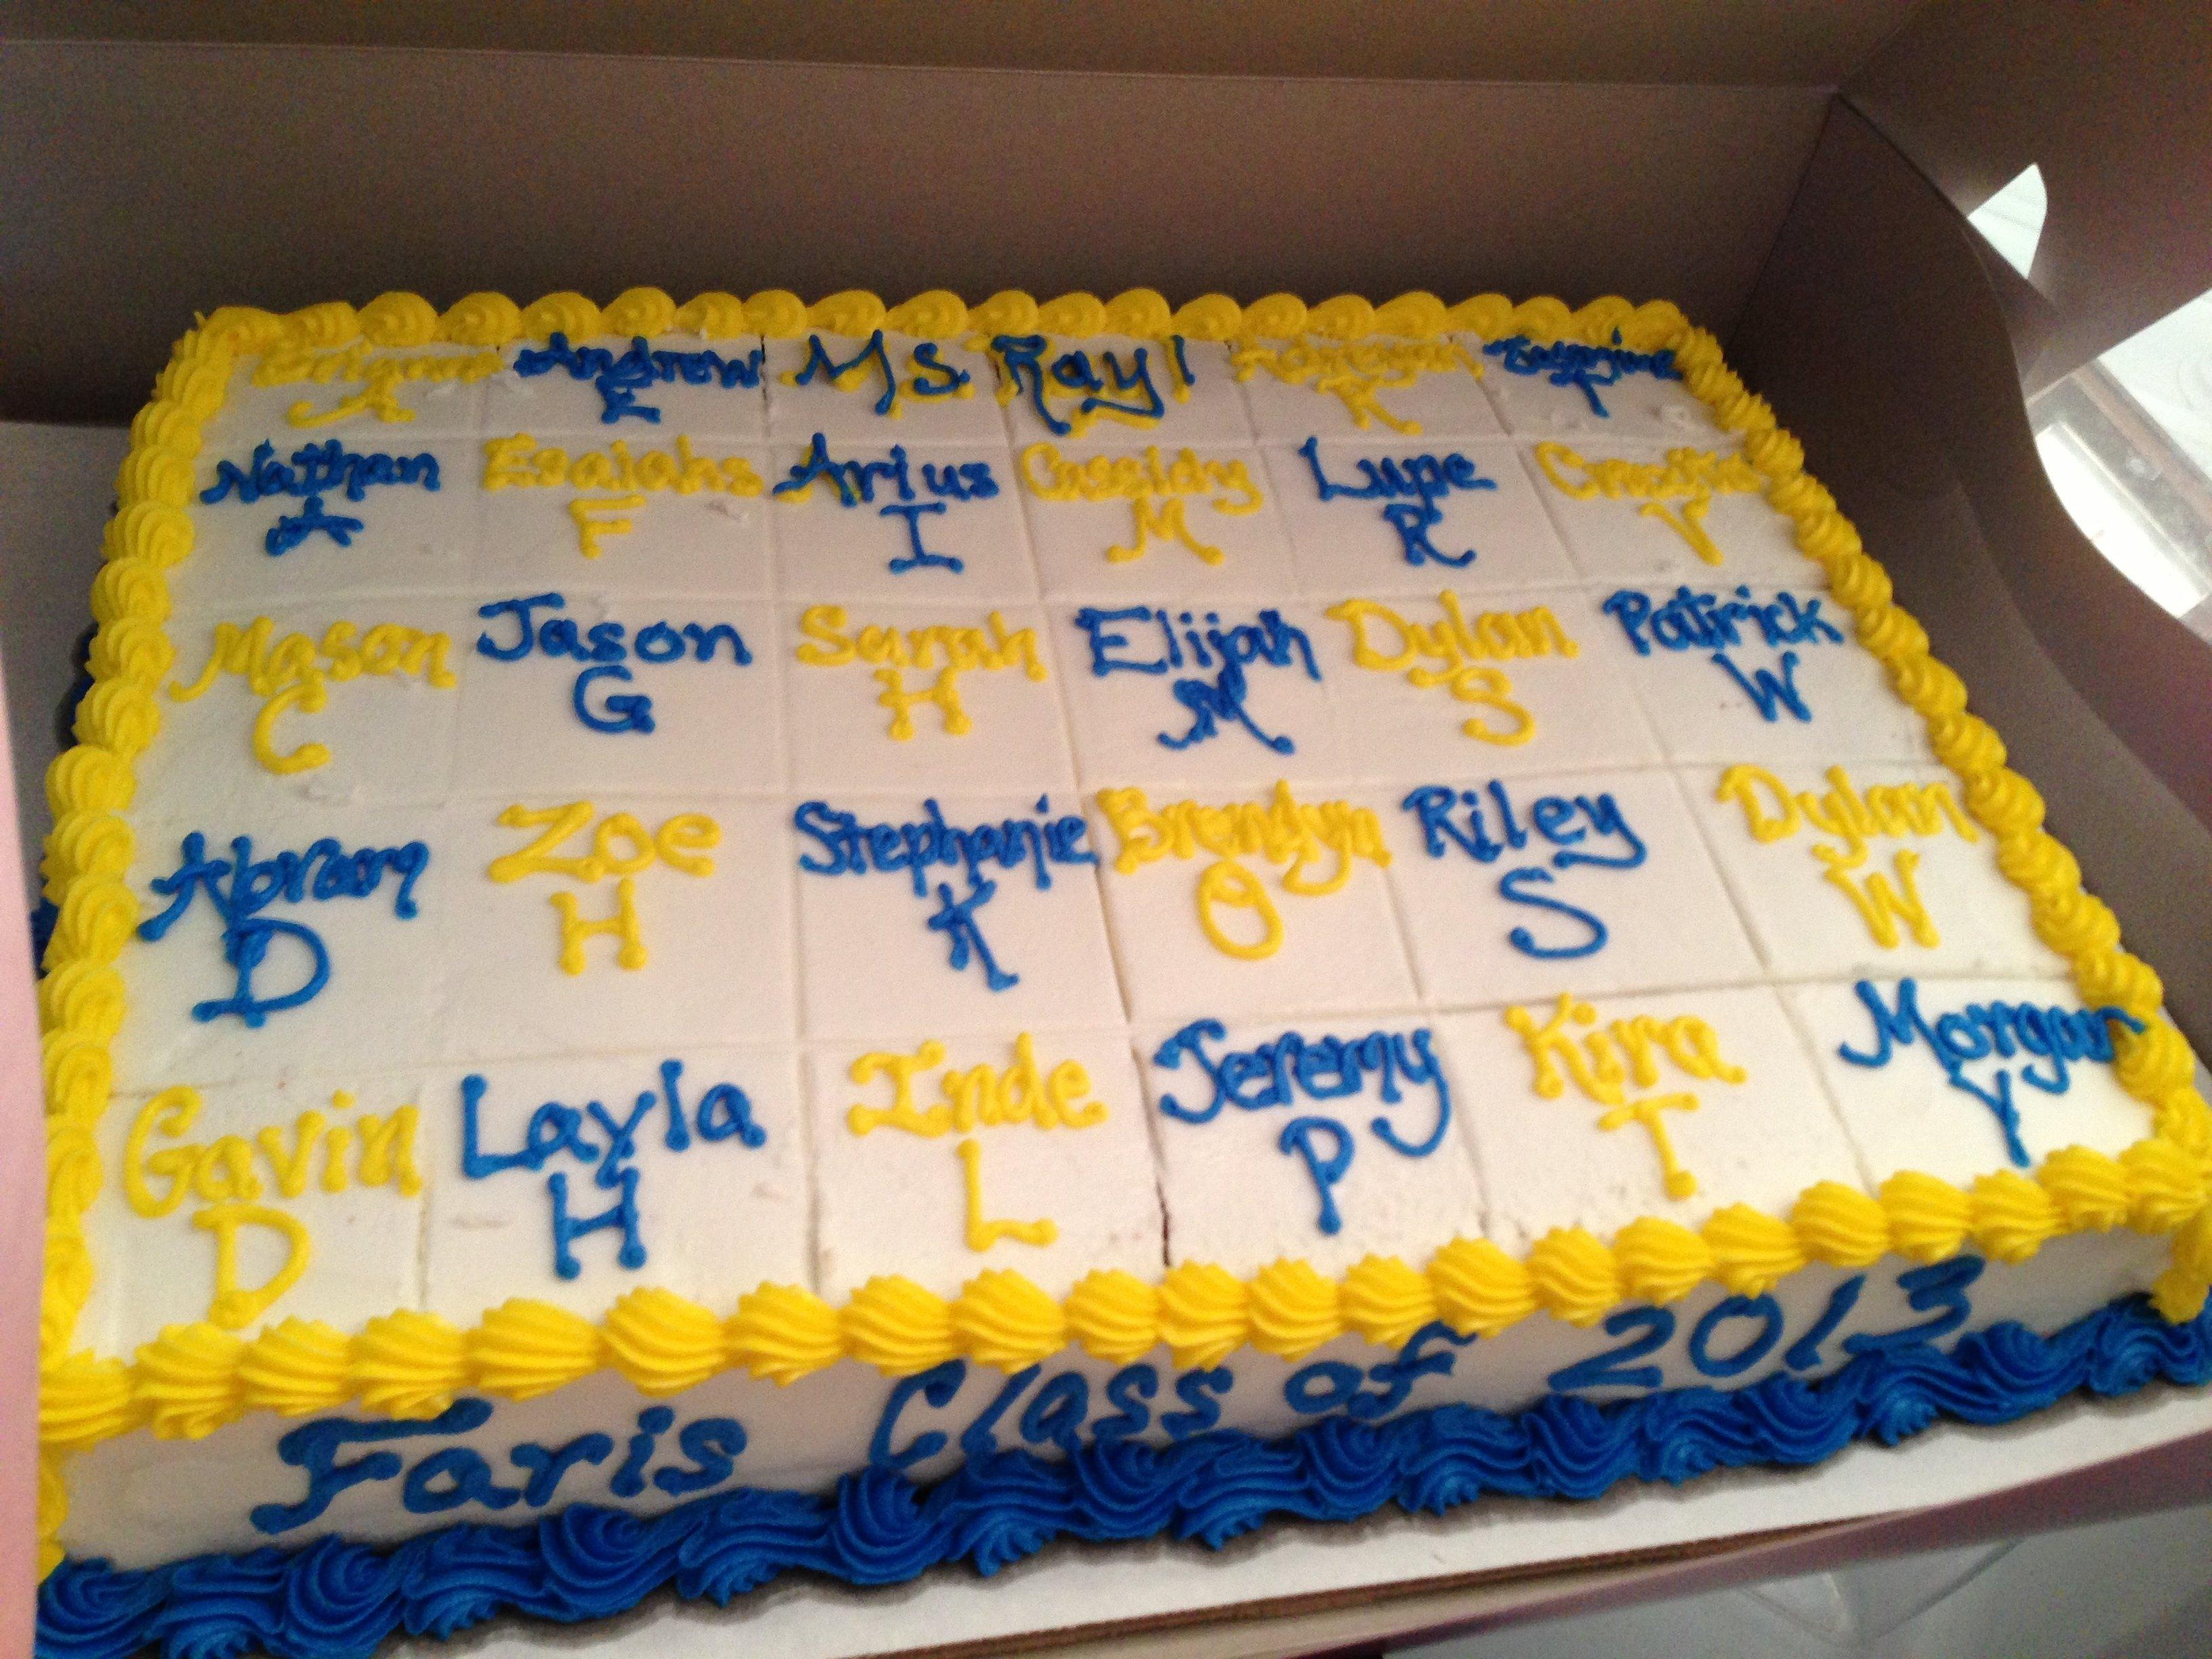 10 Fantastic 6Th Grade Graduation Party Ideas 6th grade graduation cake cakes i have made pinterest 1 2021